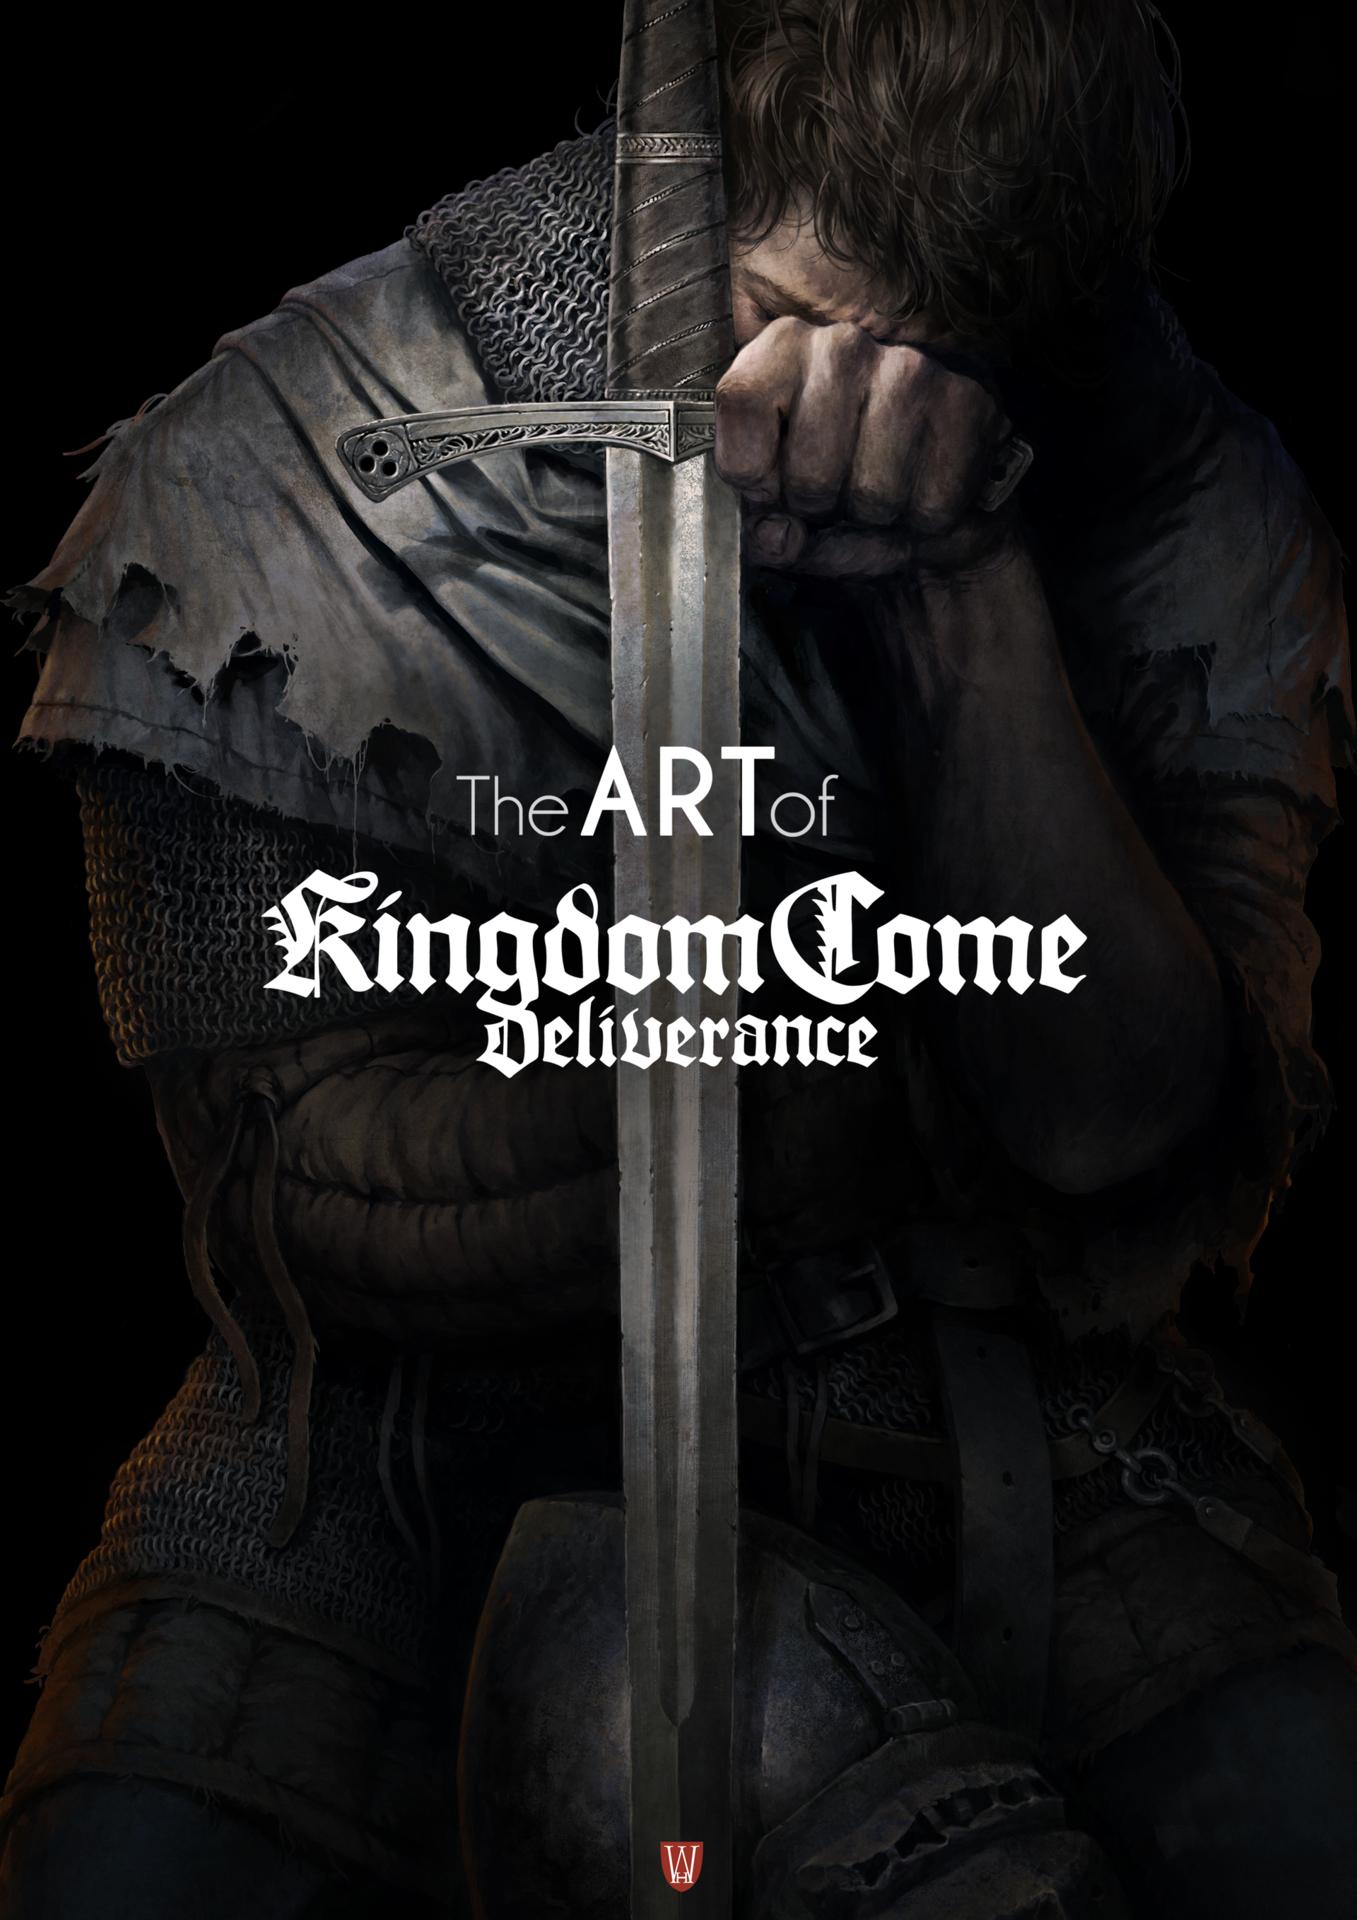 Kniha The Art of Kingdom Come: Deliverance [CZ] (poškozený obal)